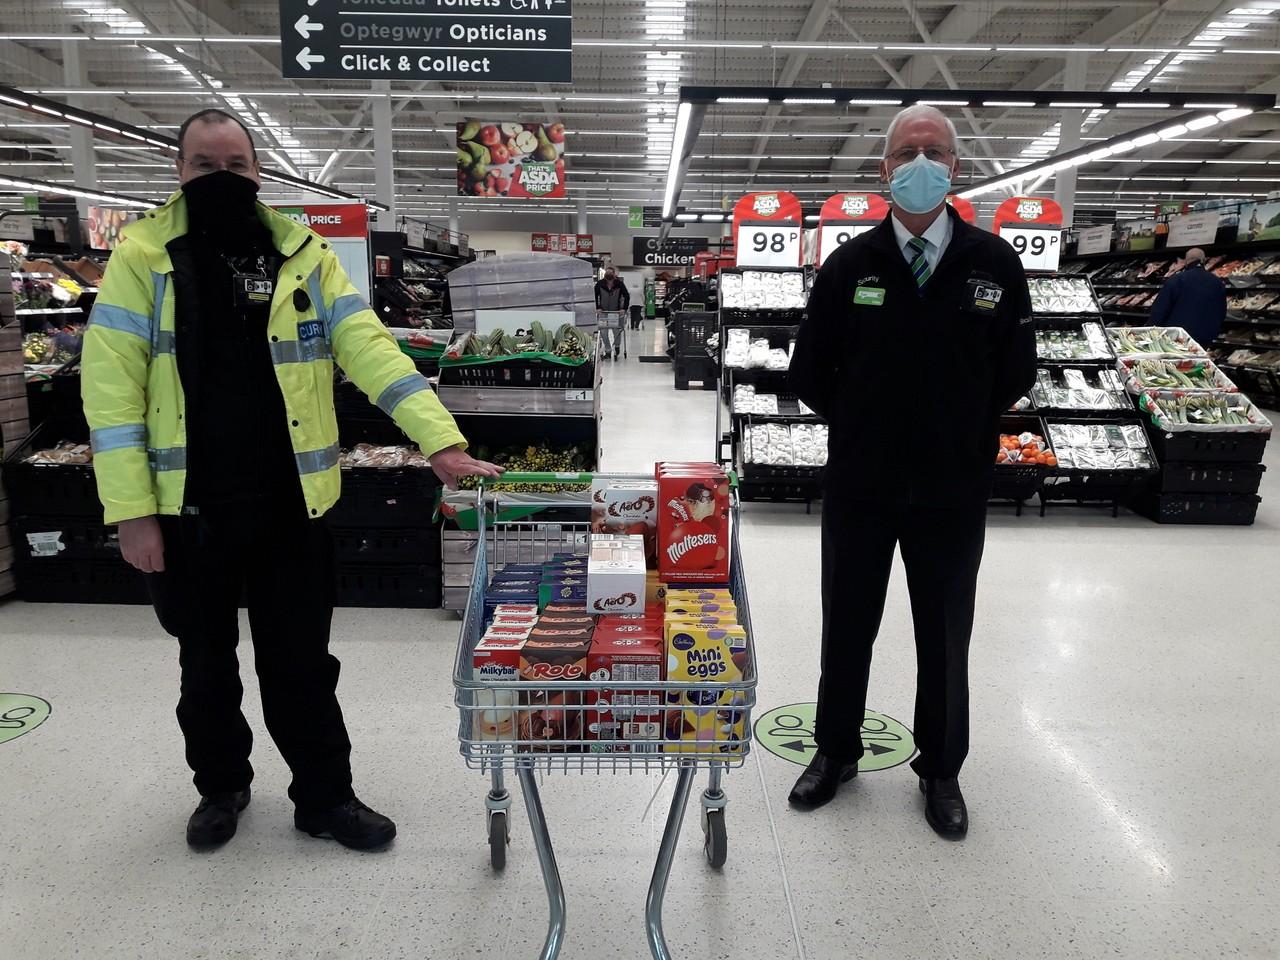 Asda Queensferry doing our bit for Flintshire Foodbank | Asda Queensferry